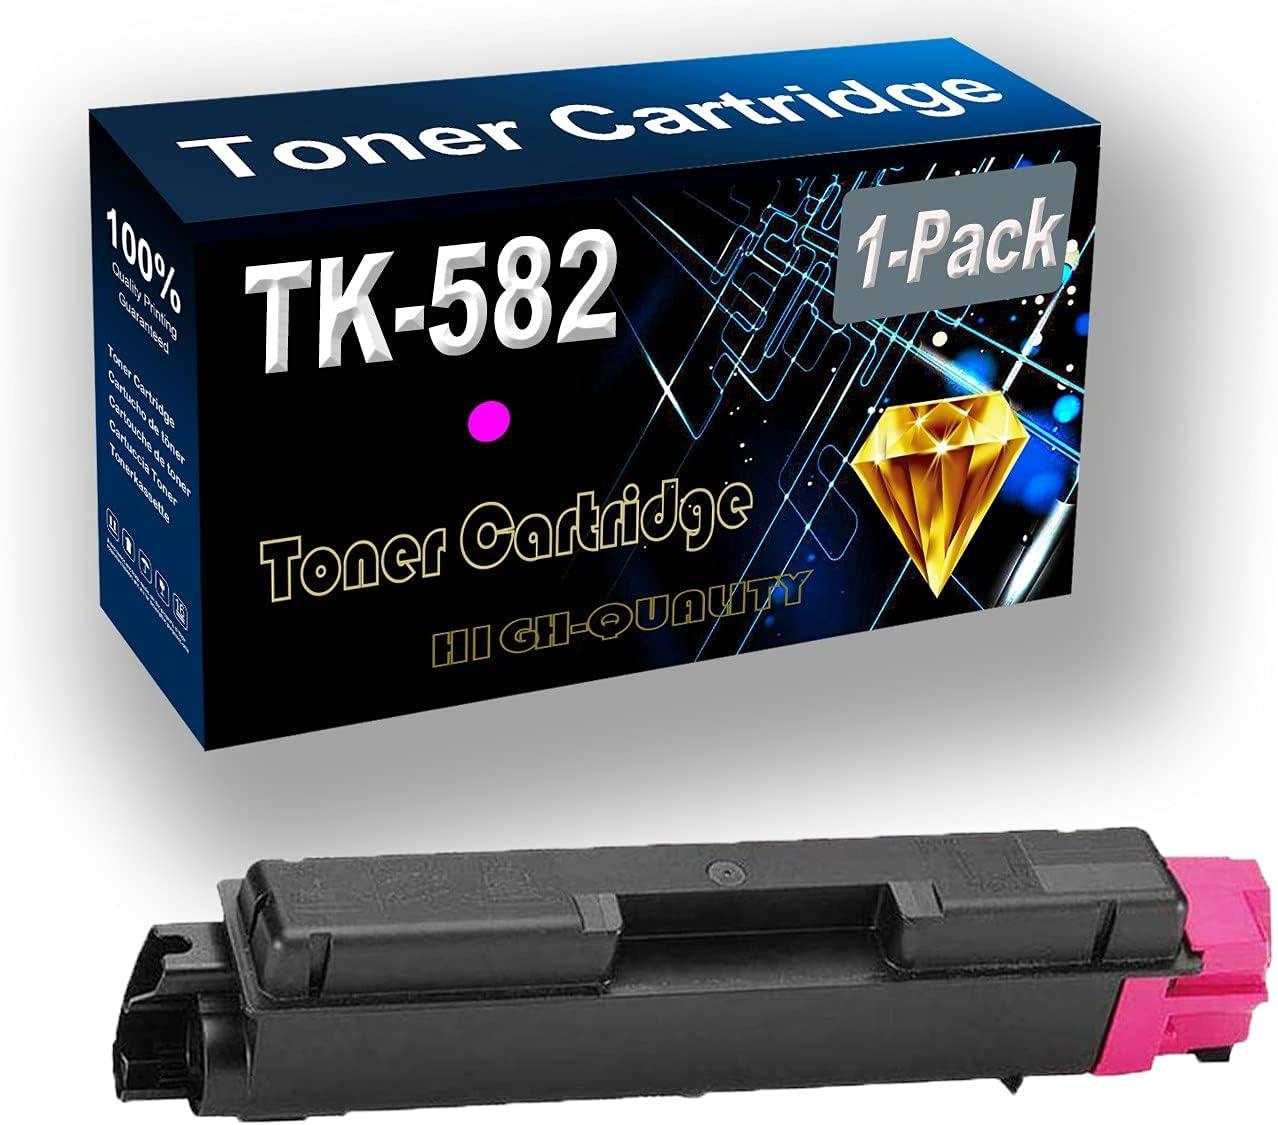 Remanufactured Toner Cartridge Replacement for Kyocera TK-582 TK582   TK-582M for Kyocera Ecosys FS-C5150DN P6021CDN Printer (1-Pack, Magenta)